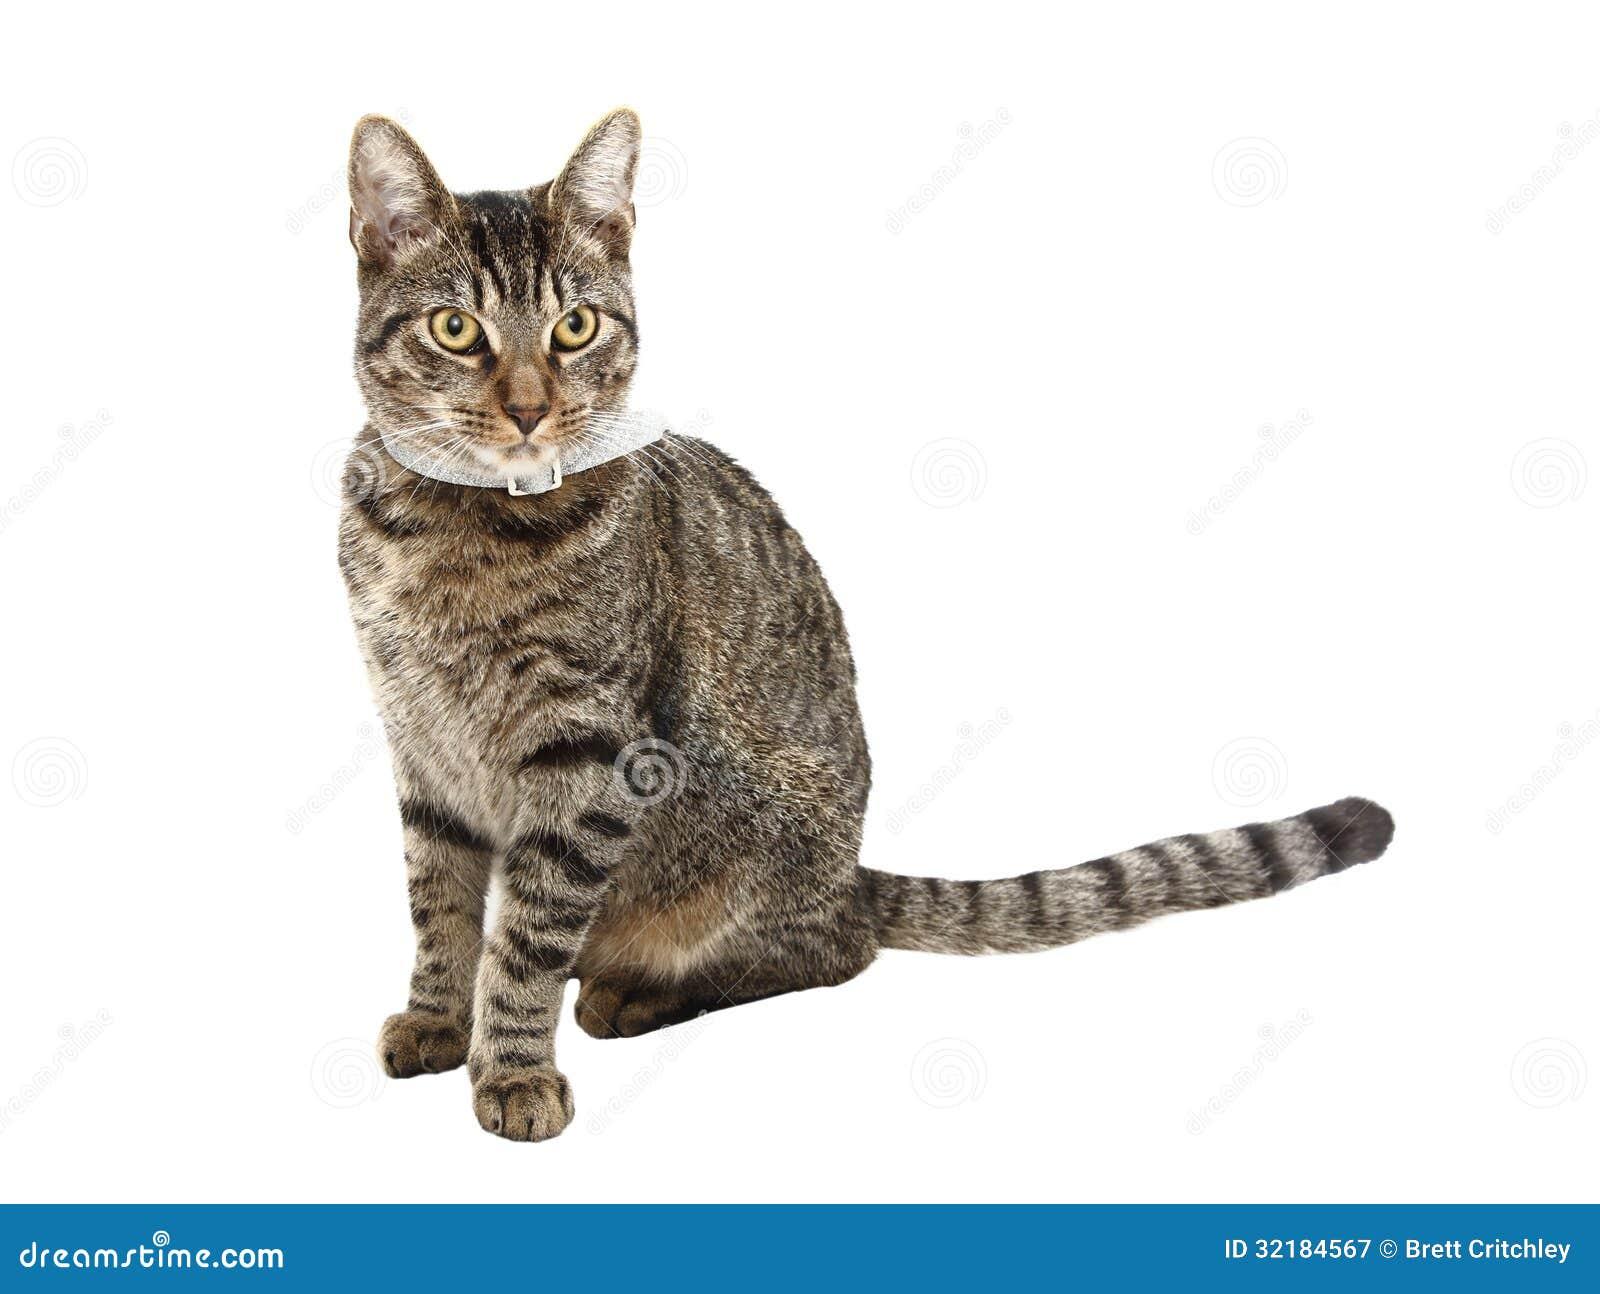 Cat Photo Against White Background